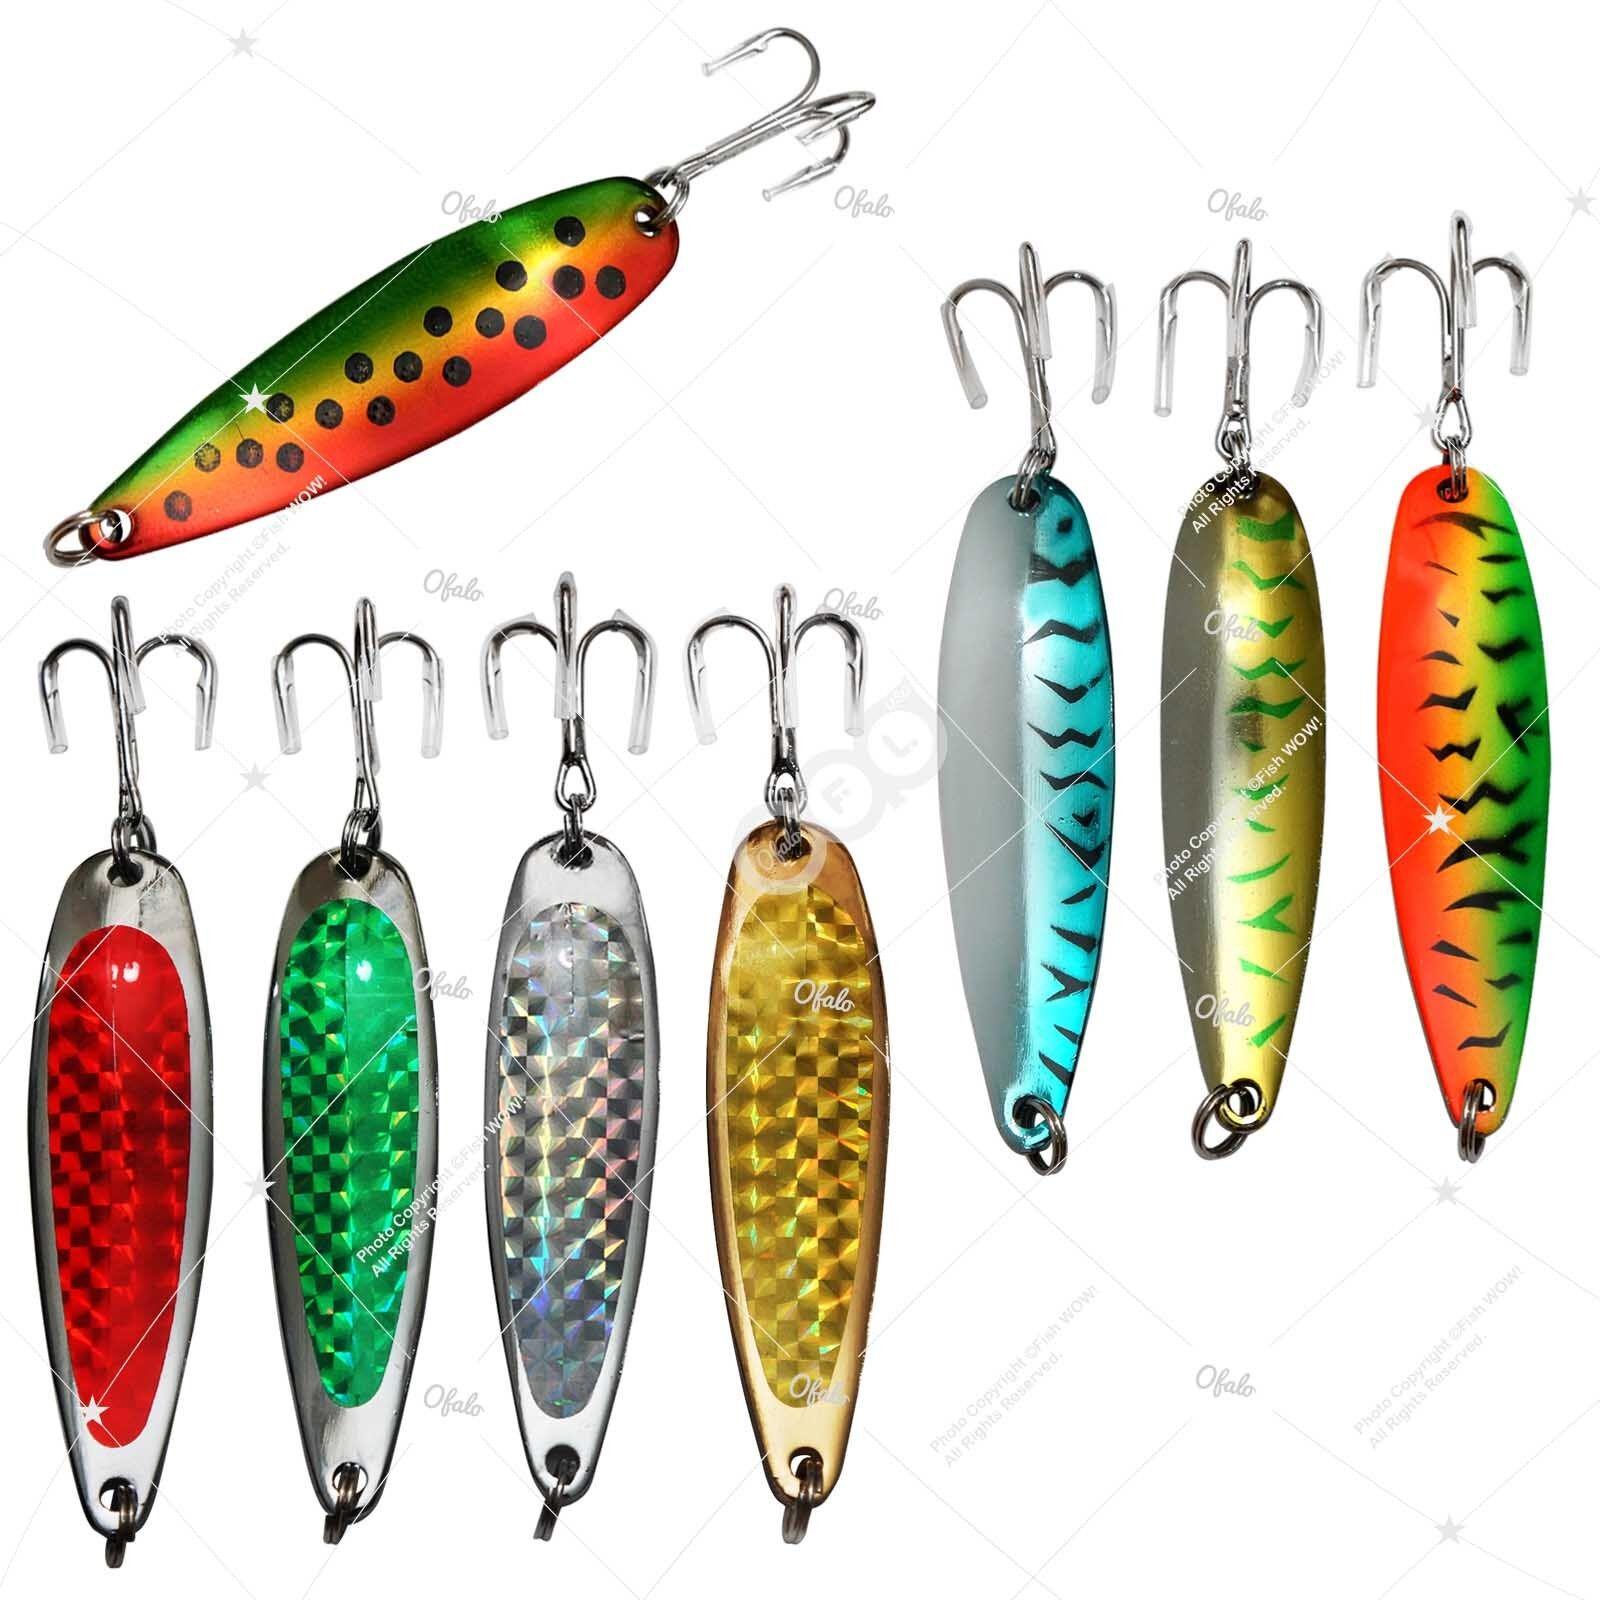 3oz 6  Fishing Spoons Treble Hook Jigging Casting Trolling Lures baits Rigs lot